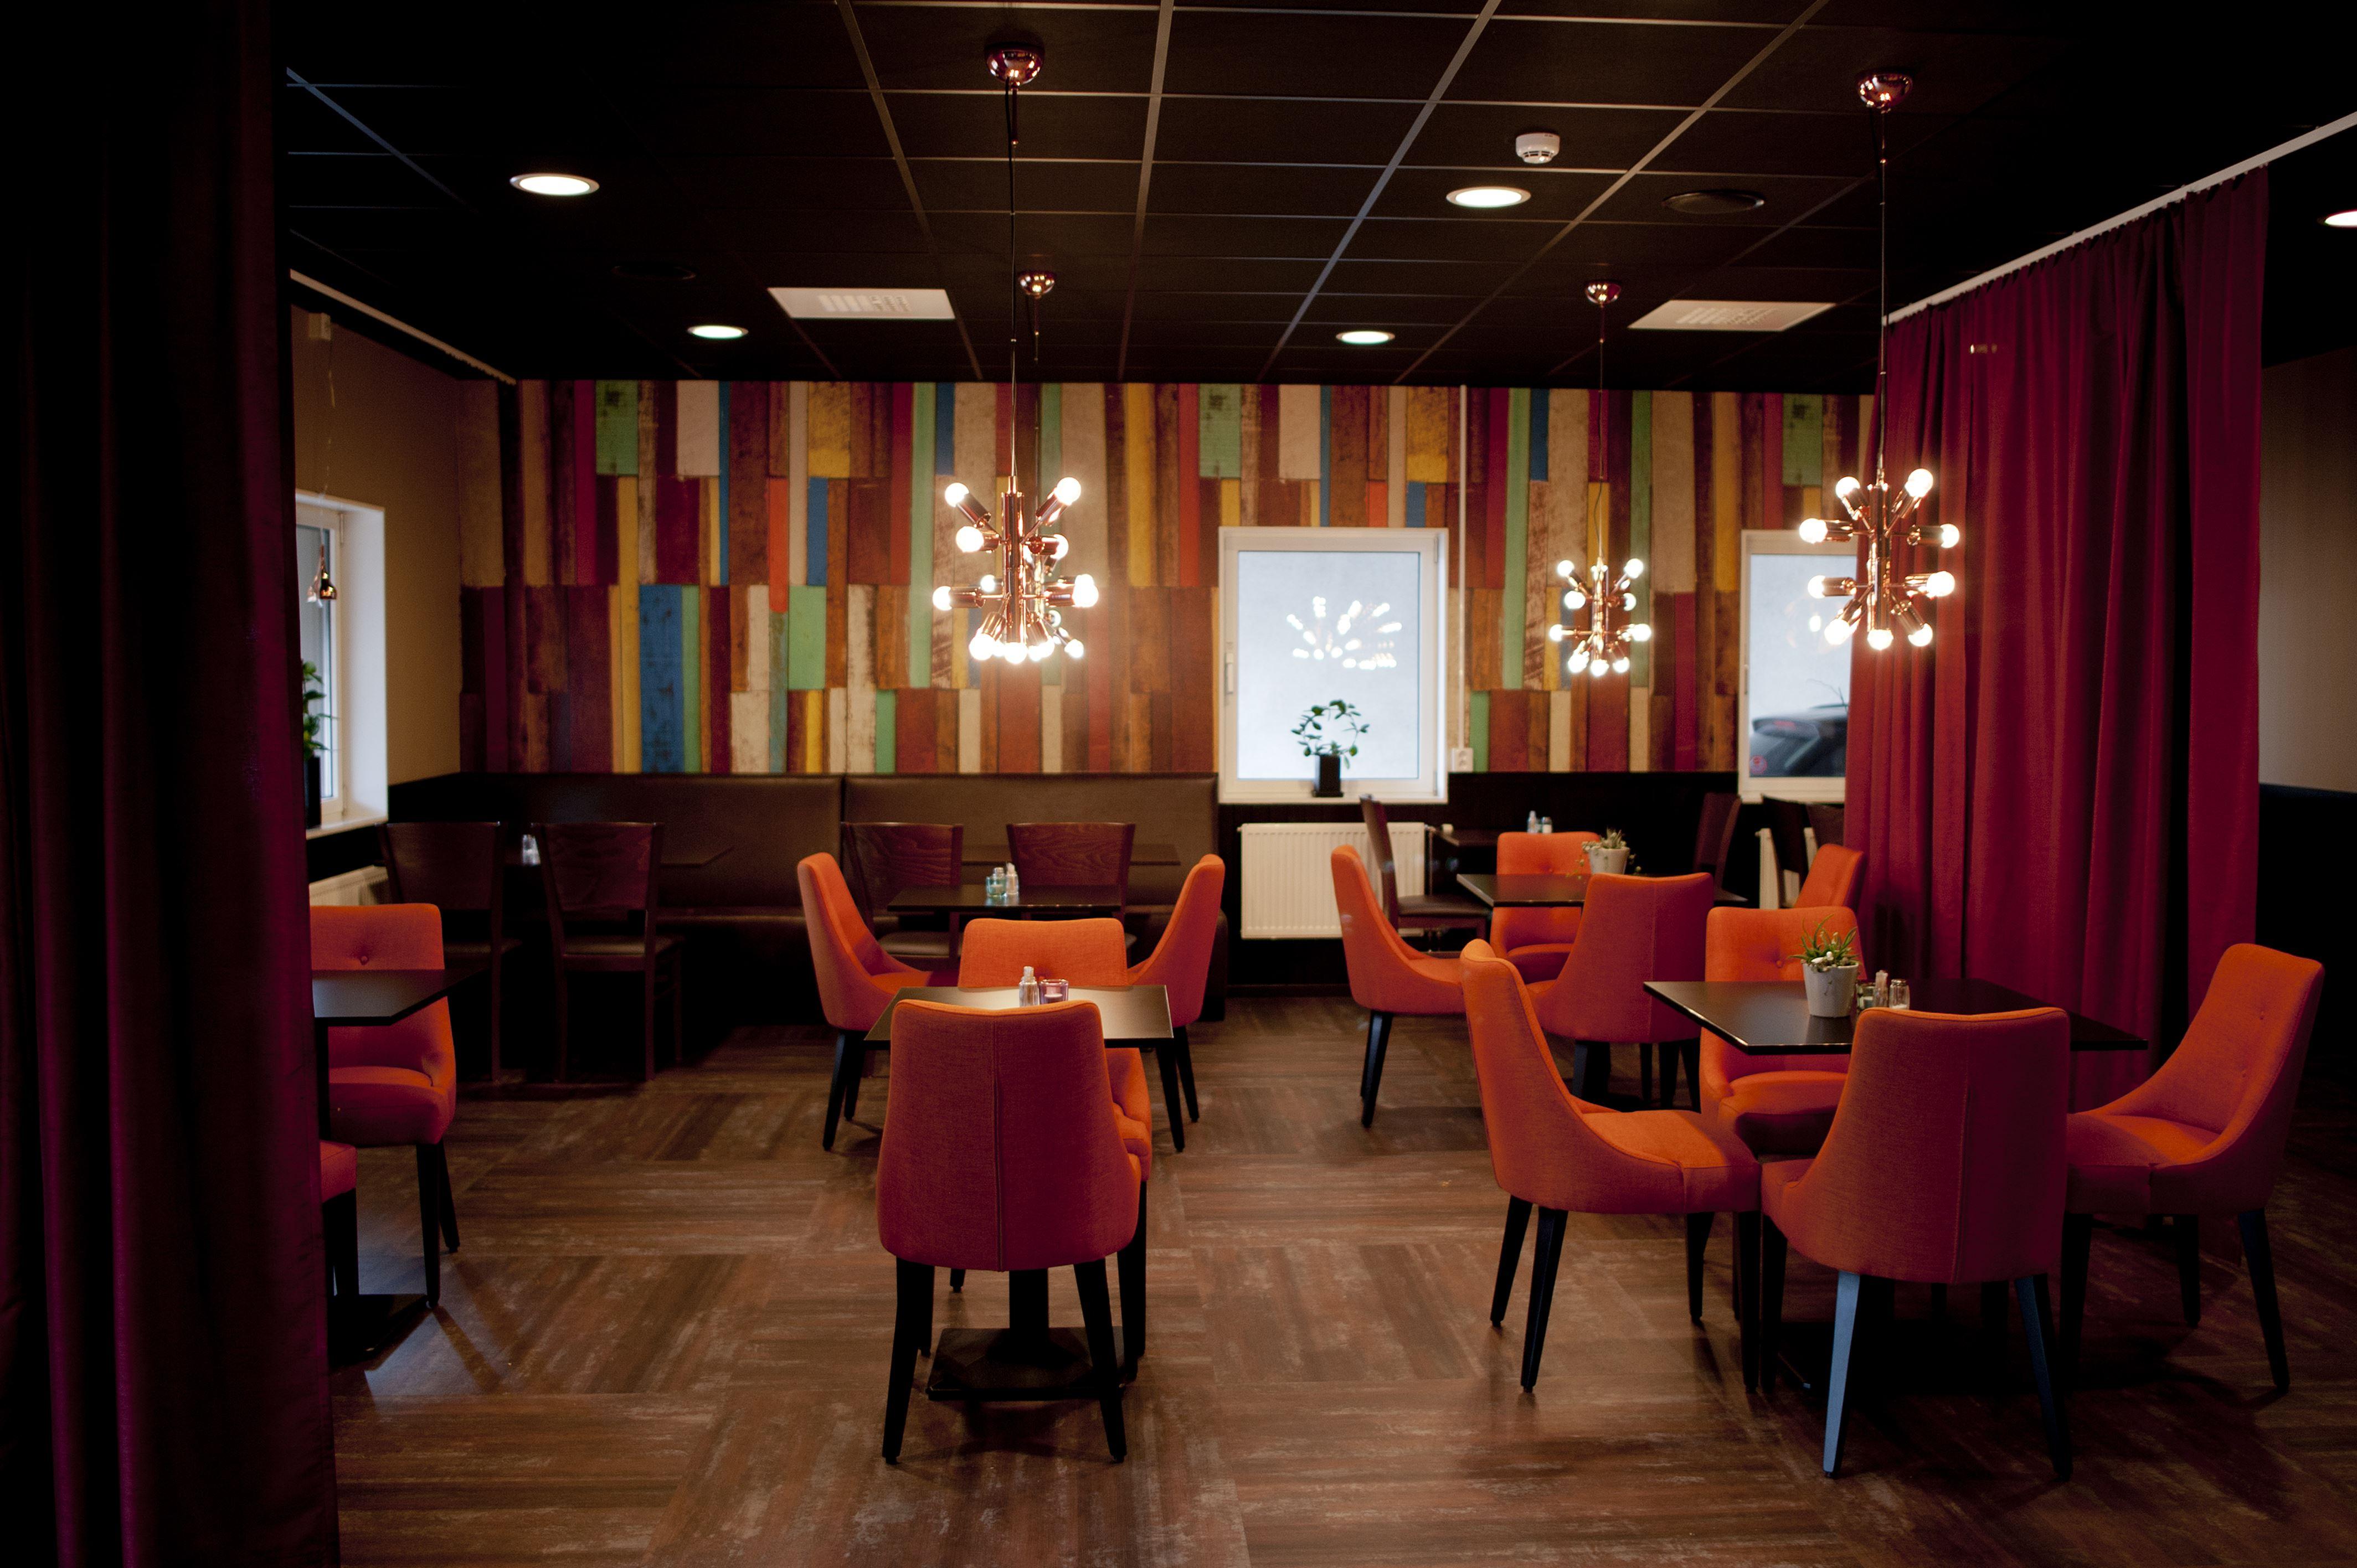 © Centralhotellet, Centralhotellets restaurang